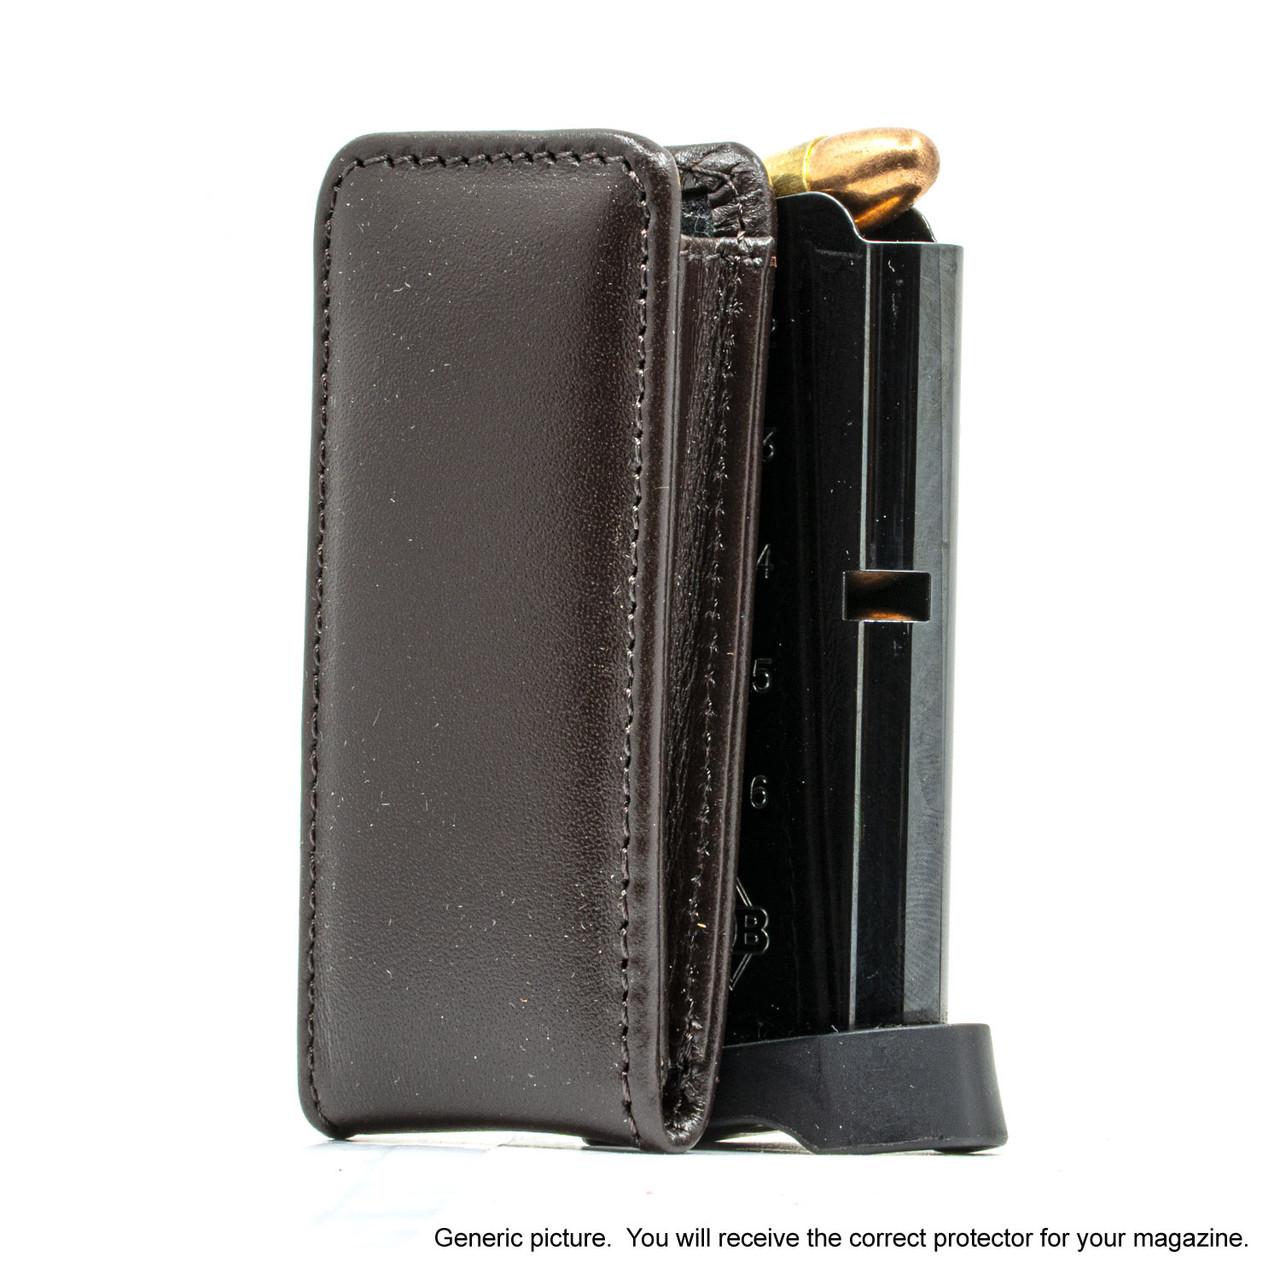 Bersa Thunder 380 Brown Leather Magazine Pocket Protector